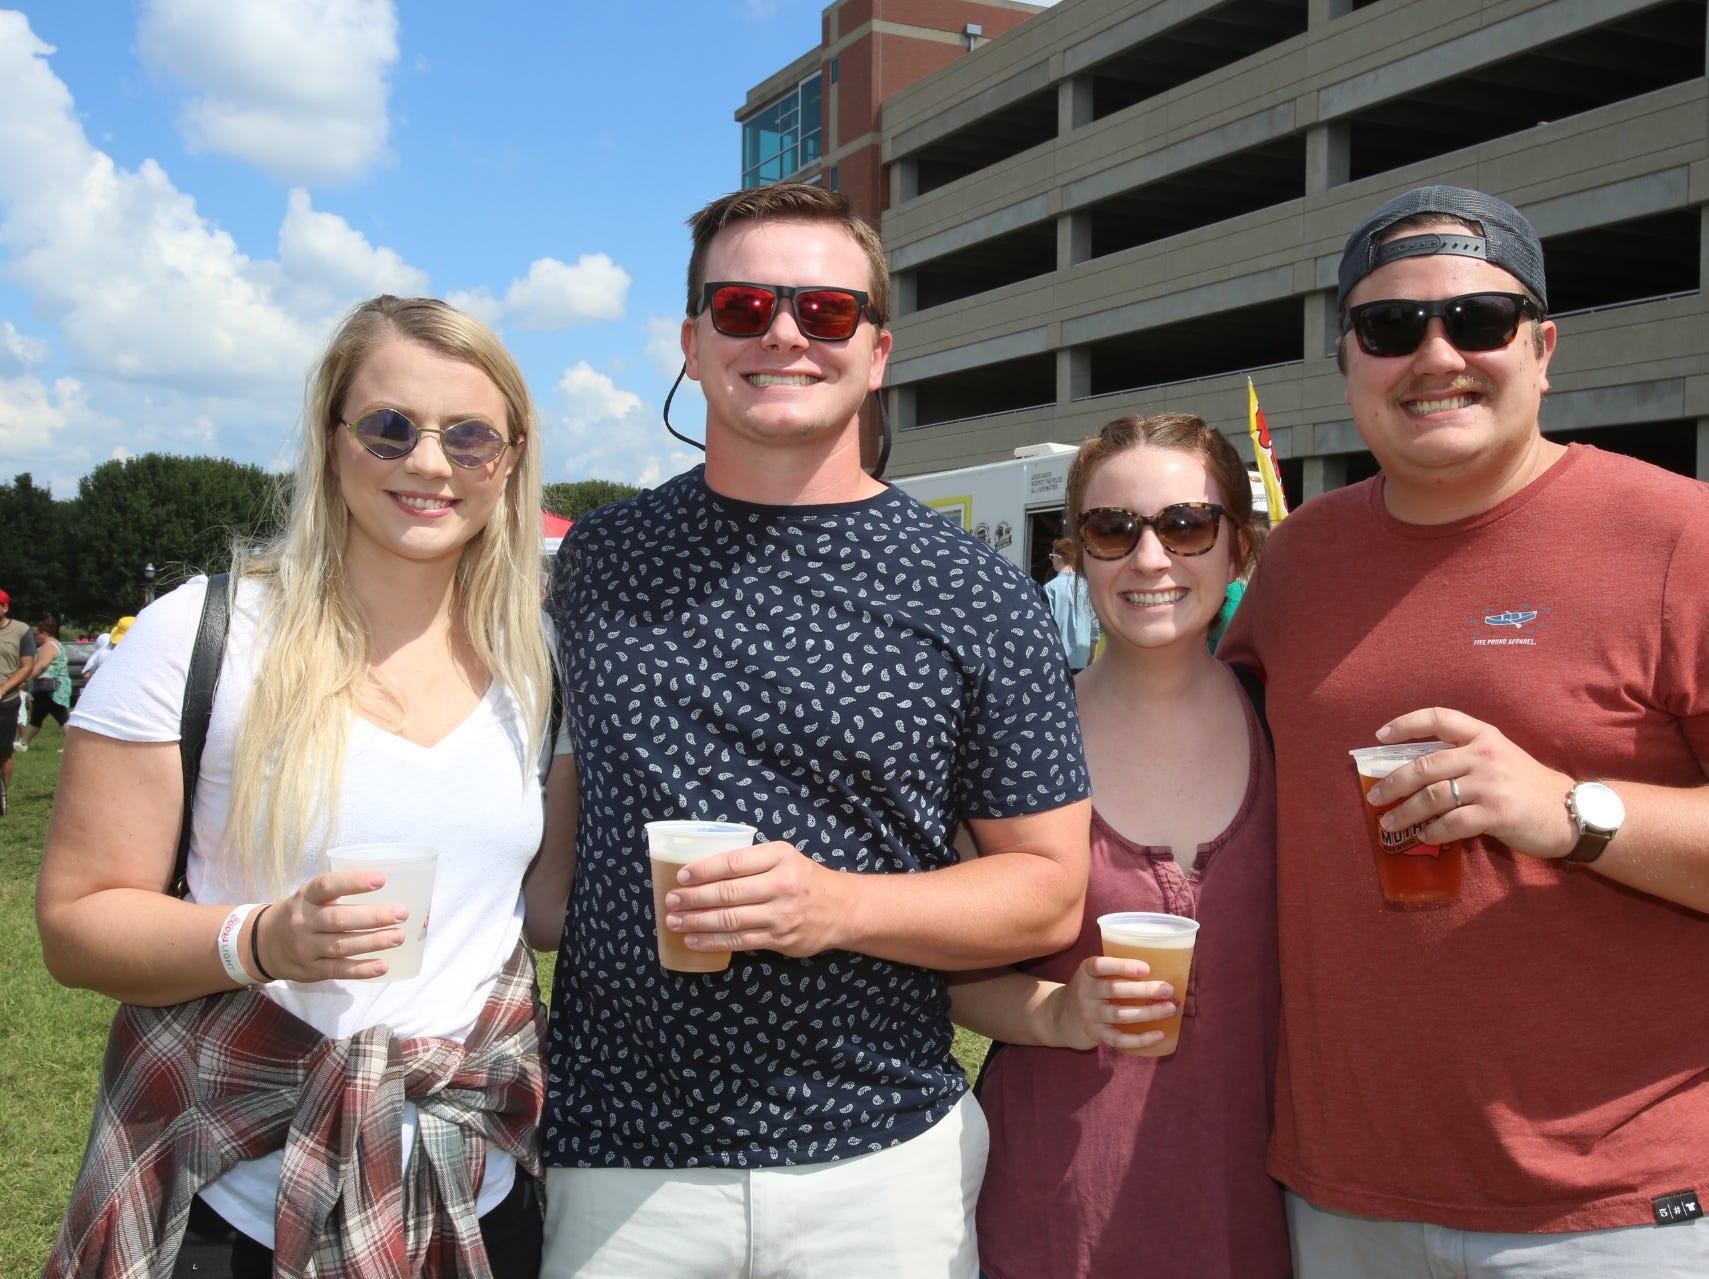 Katy Moore and Mitchell, Anna, and Garrett Capra